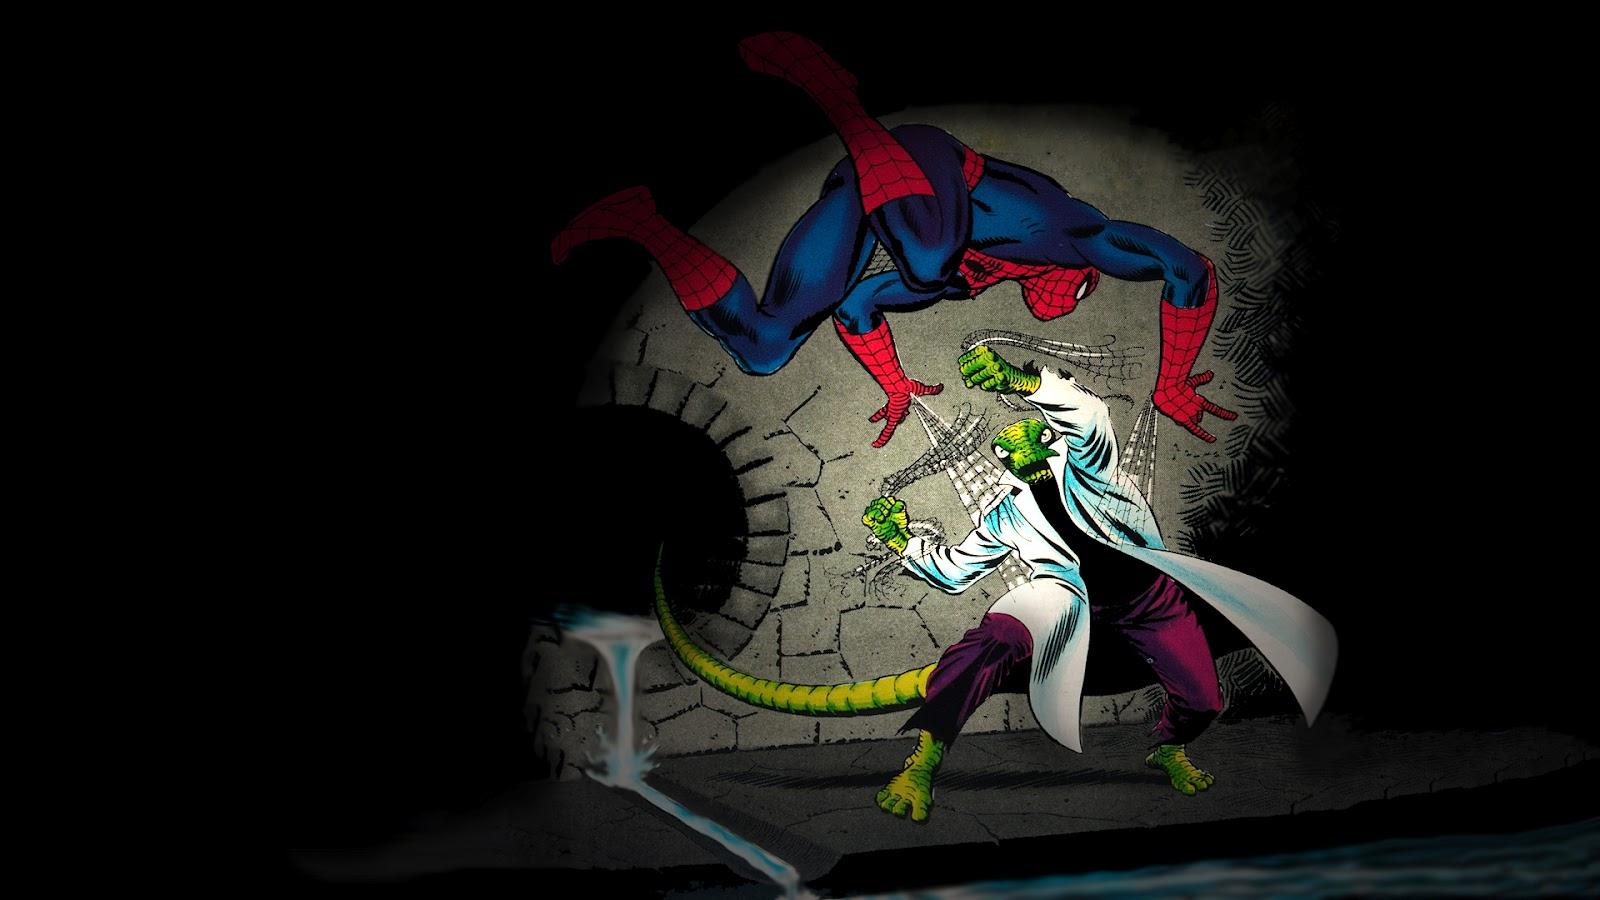 Wonderful Wallpaper Marvel Lizard - Spiderman+Vs+The+Lizard+Wallpaper  Pictures_946293.jpg